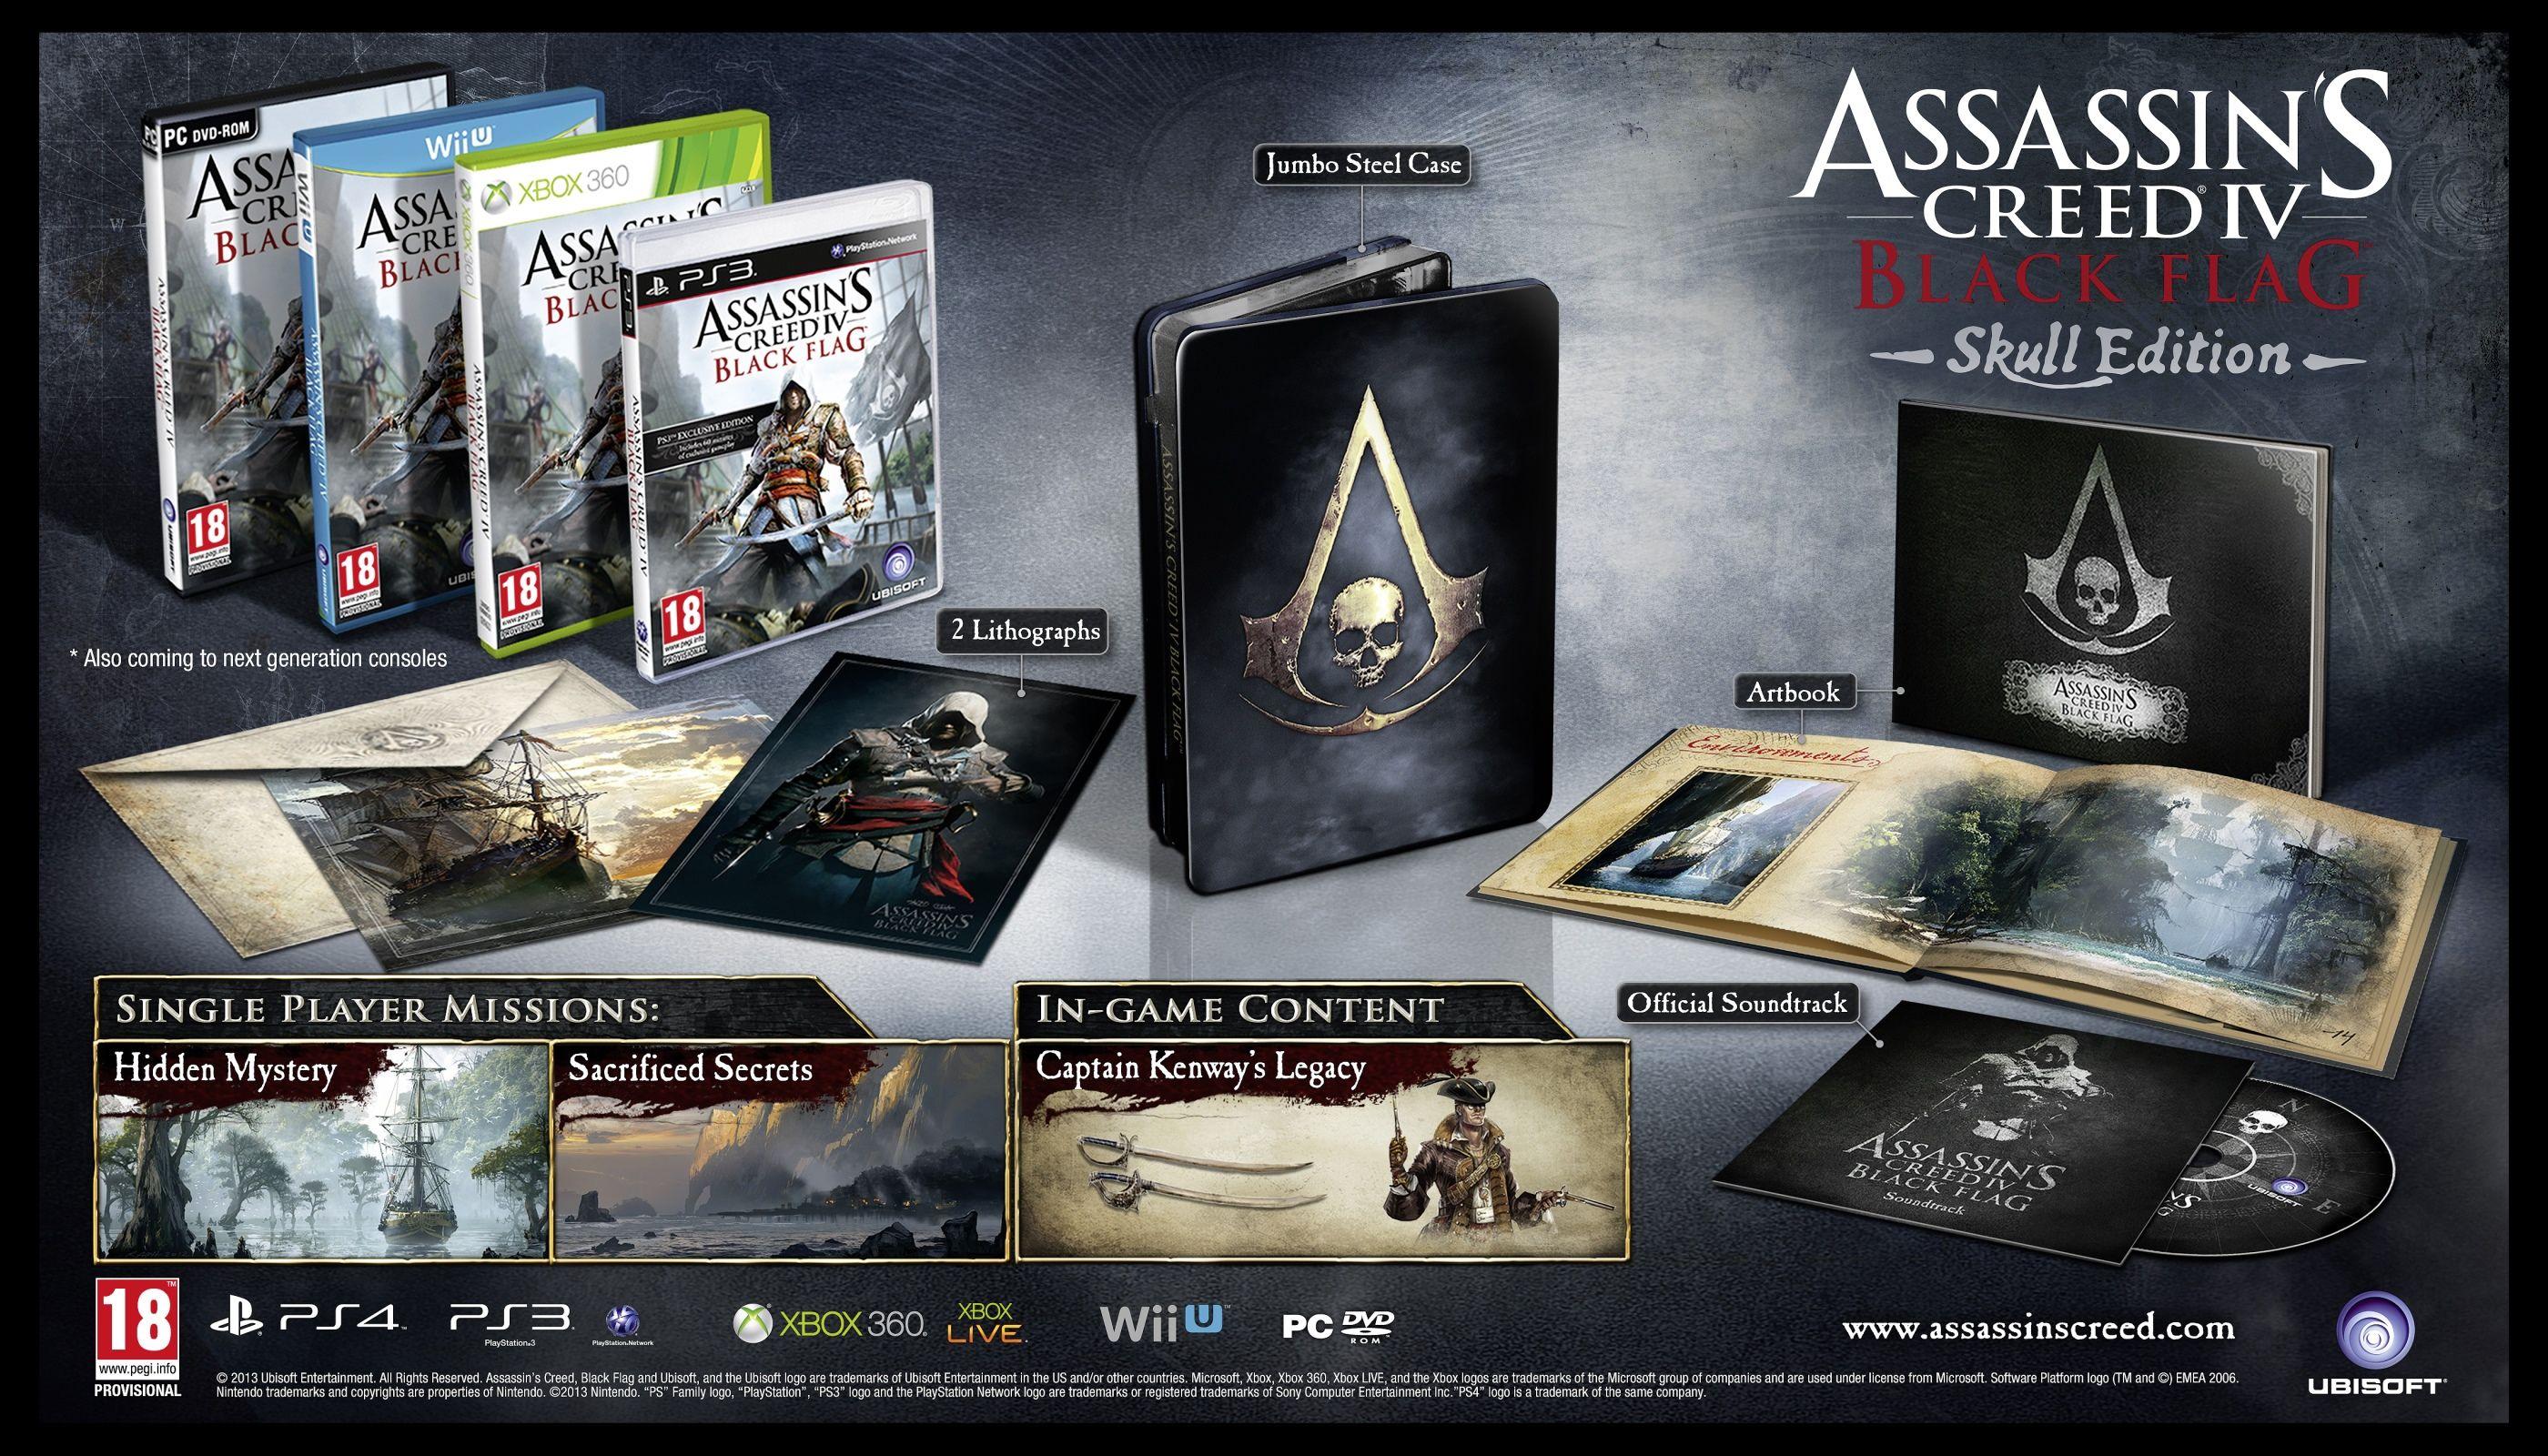 Here Is The Assassins Creed Iv Black Flag Skull Edition Harrrr